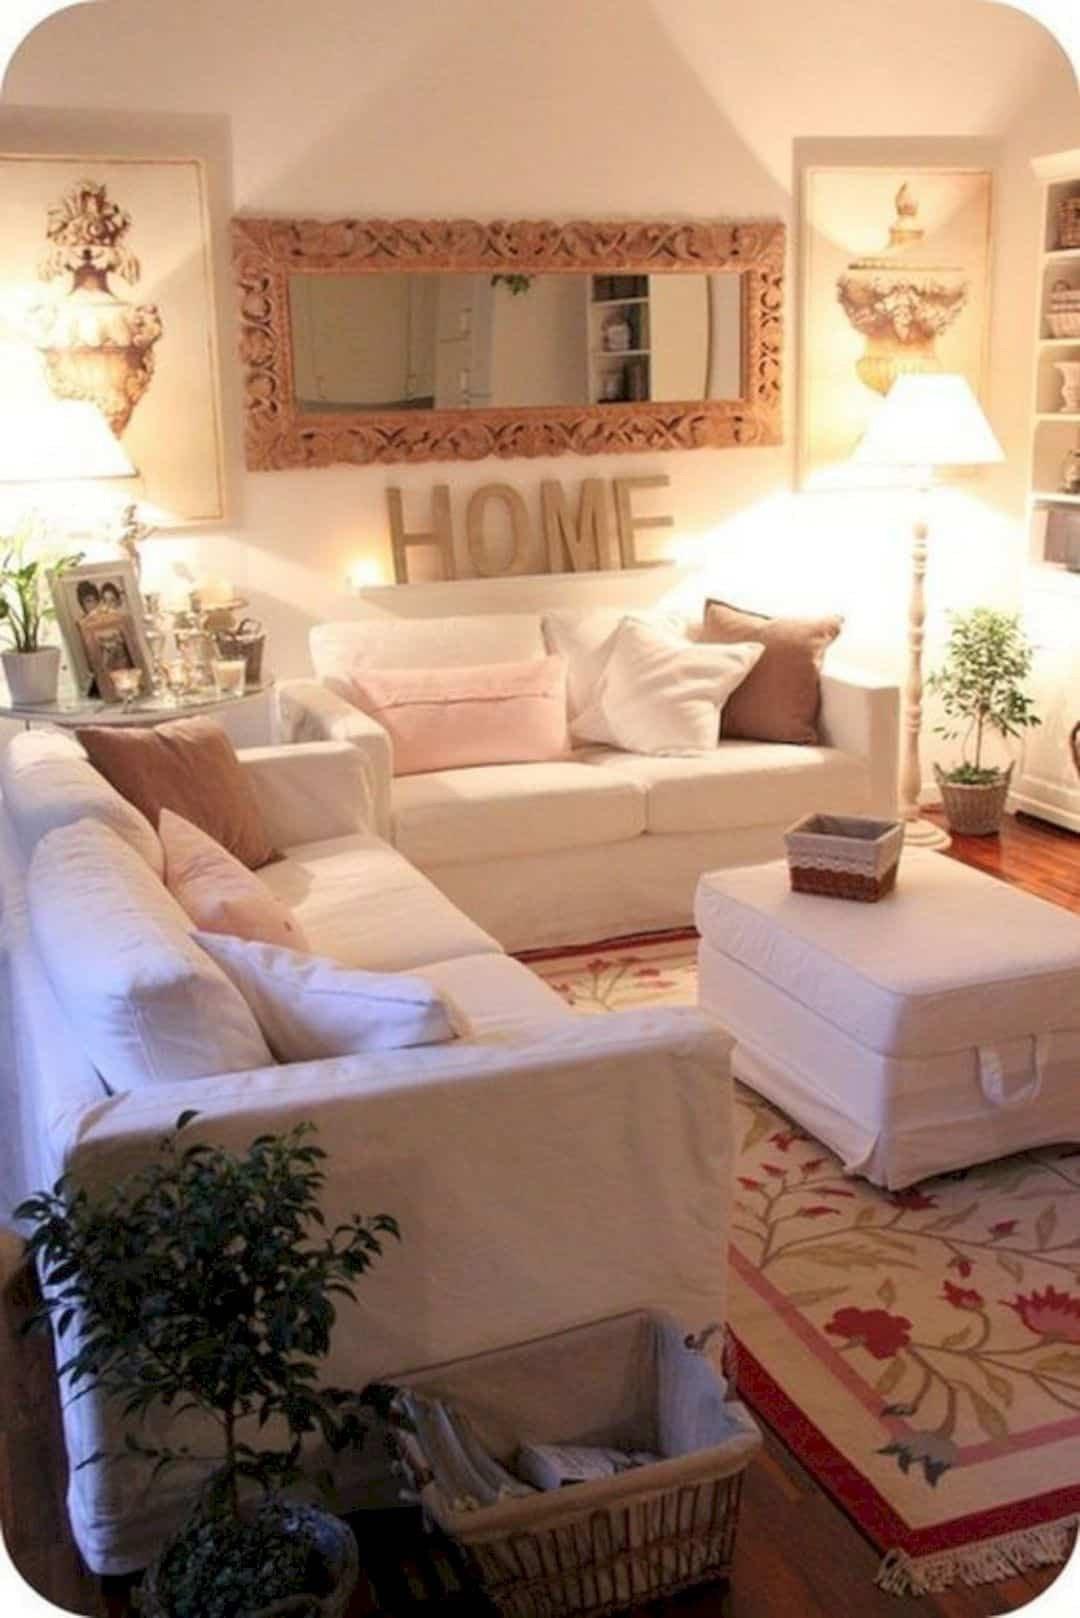 Small Living Room Diy Ideas Luxury 18 Home Decor Ideas for Small Living Room